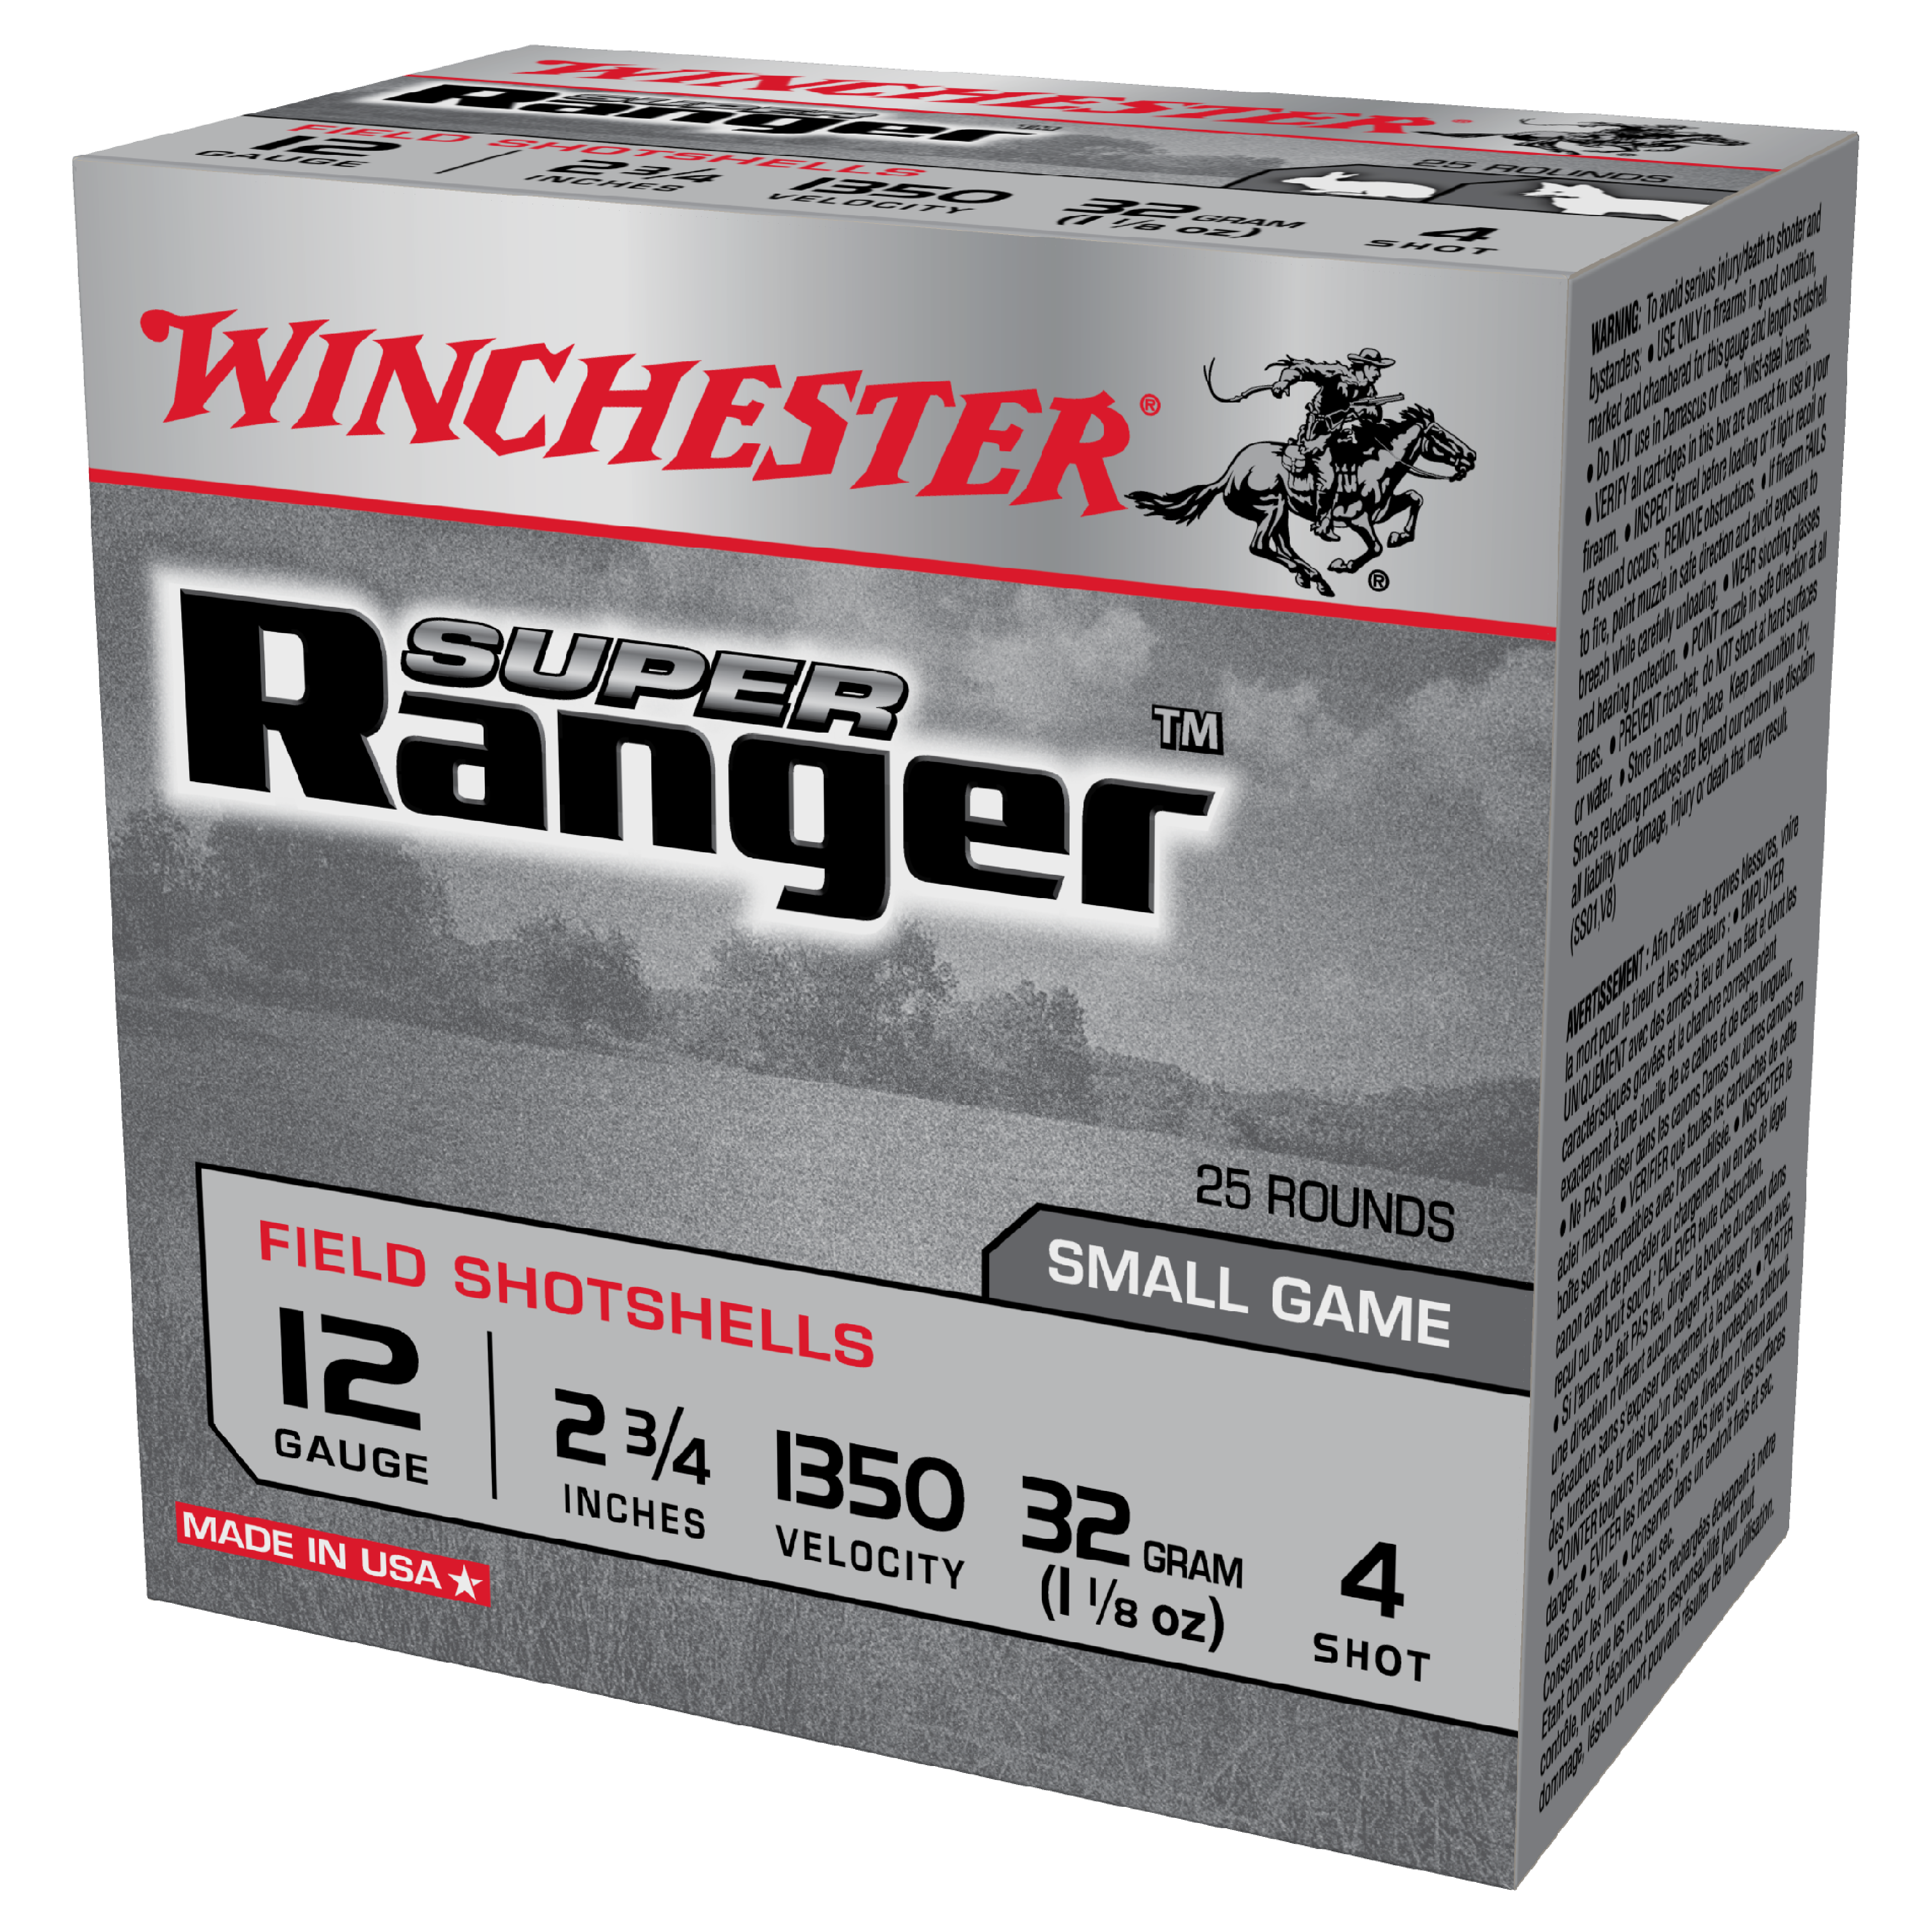 Winchester Super Ranger 12G 4 2-3/4